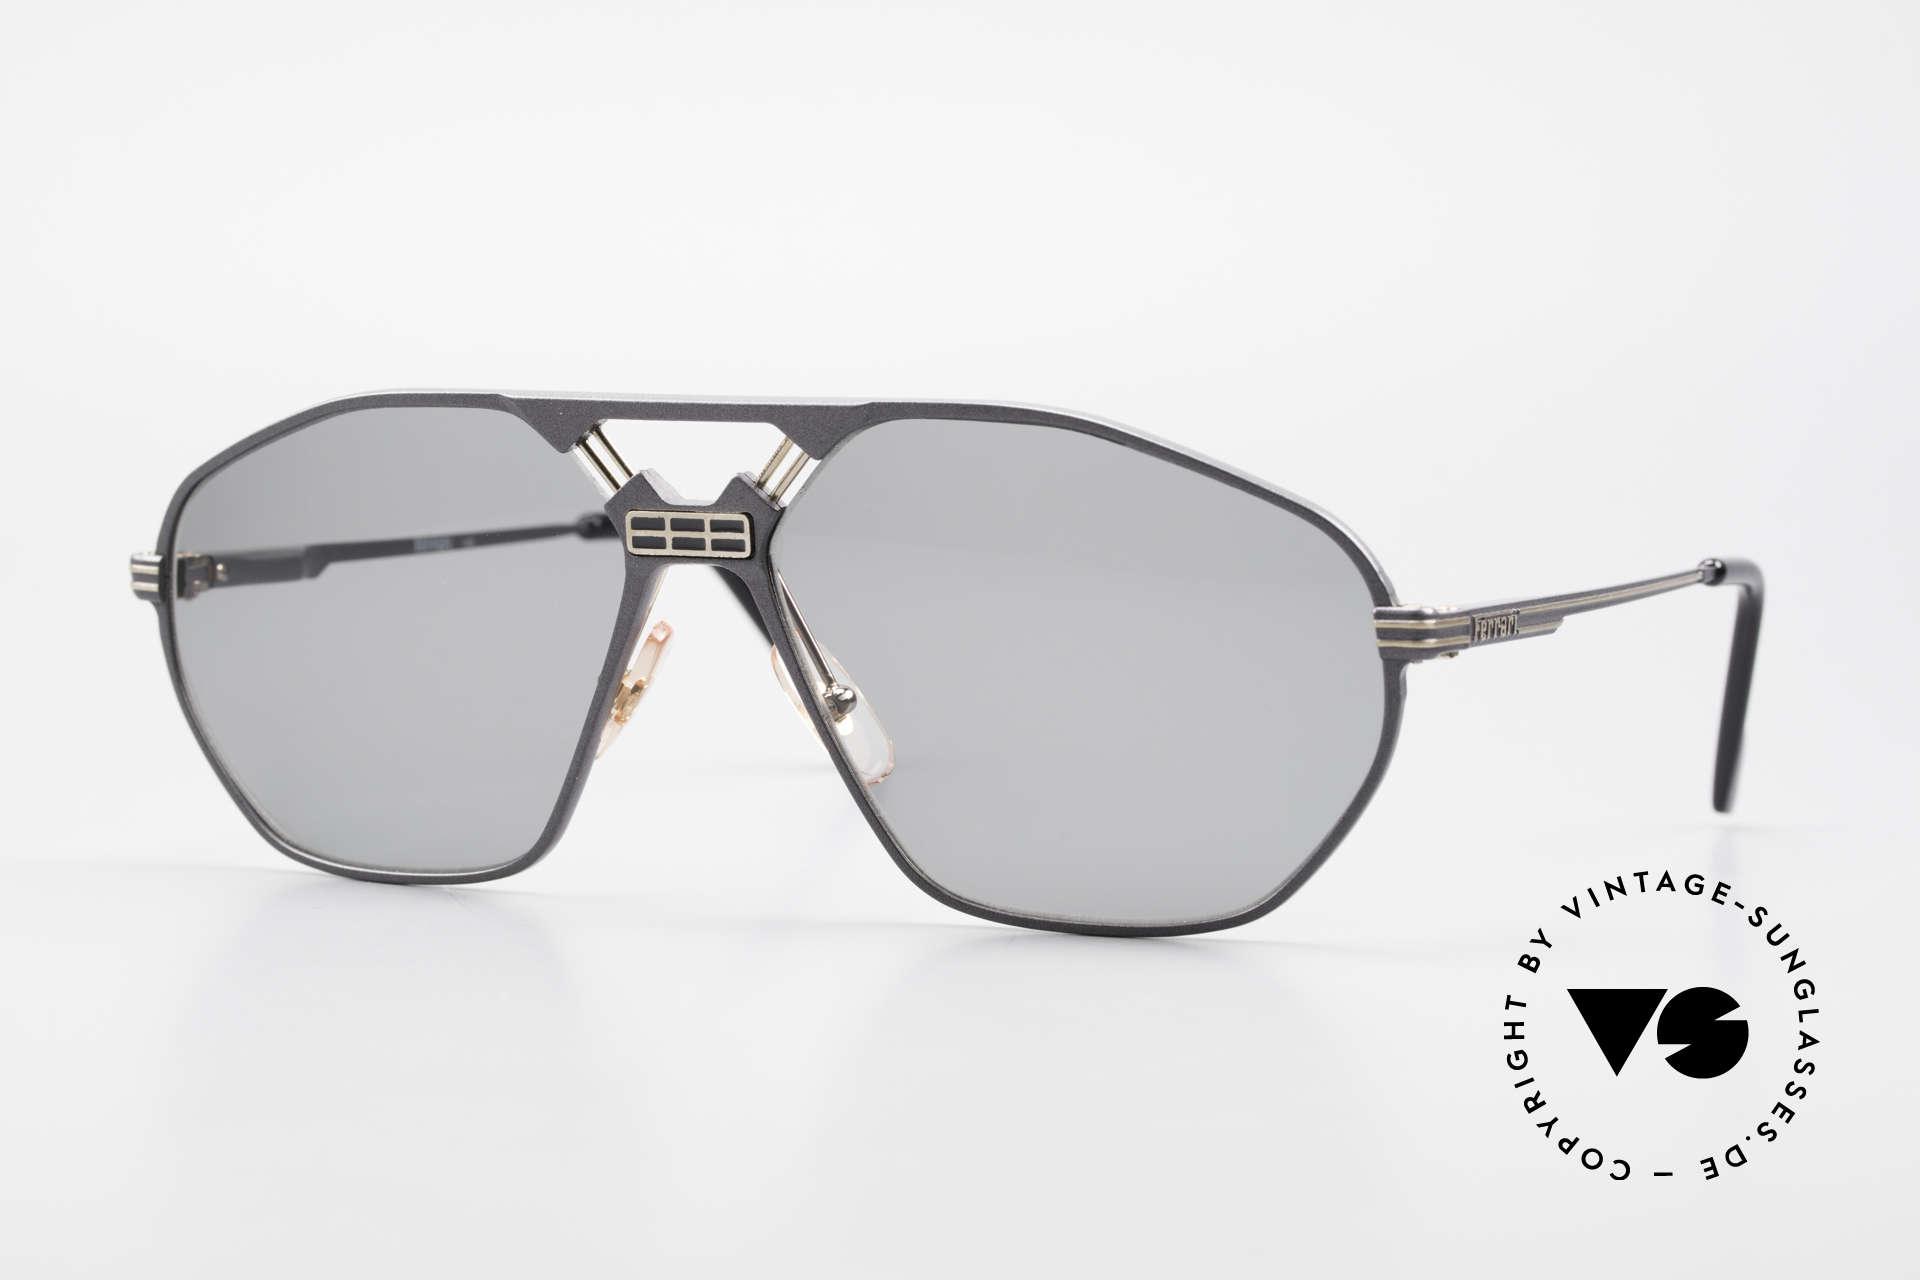 Ferrari F22/S Men's Rare Vintage Shades XL, luxury designer sunglasses by Ferrari from 1992/93, Made for Men